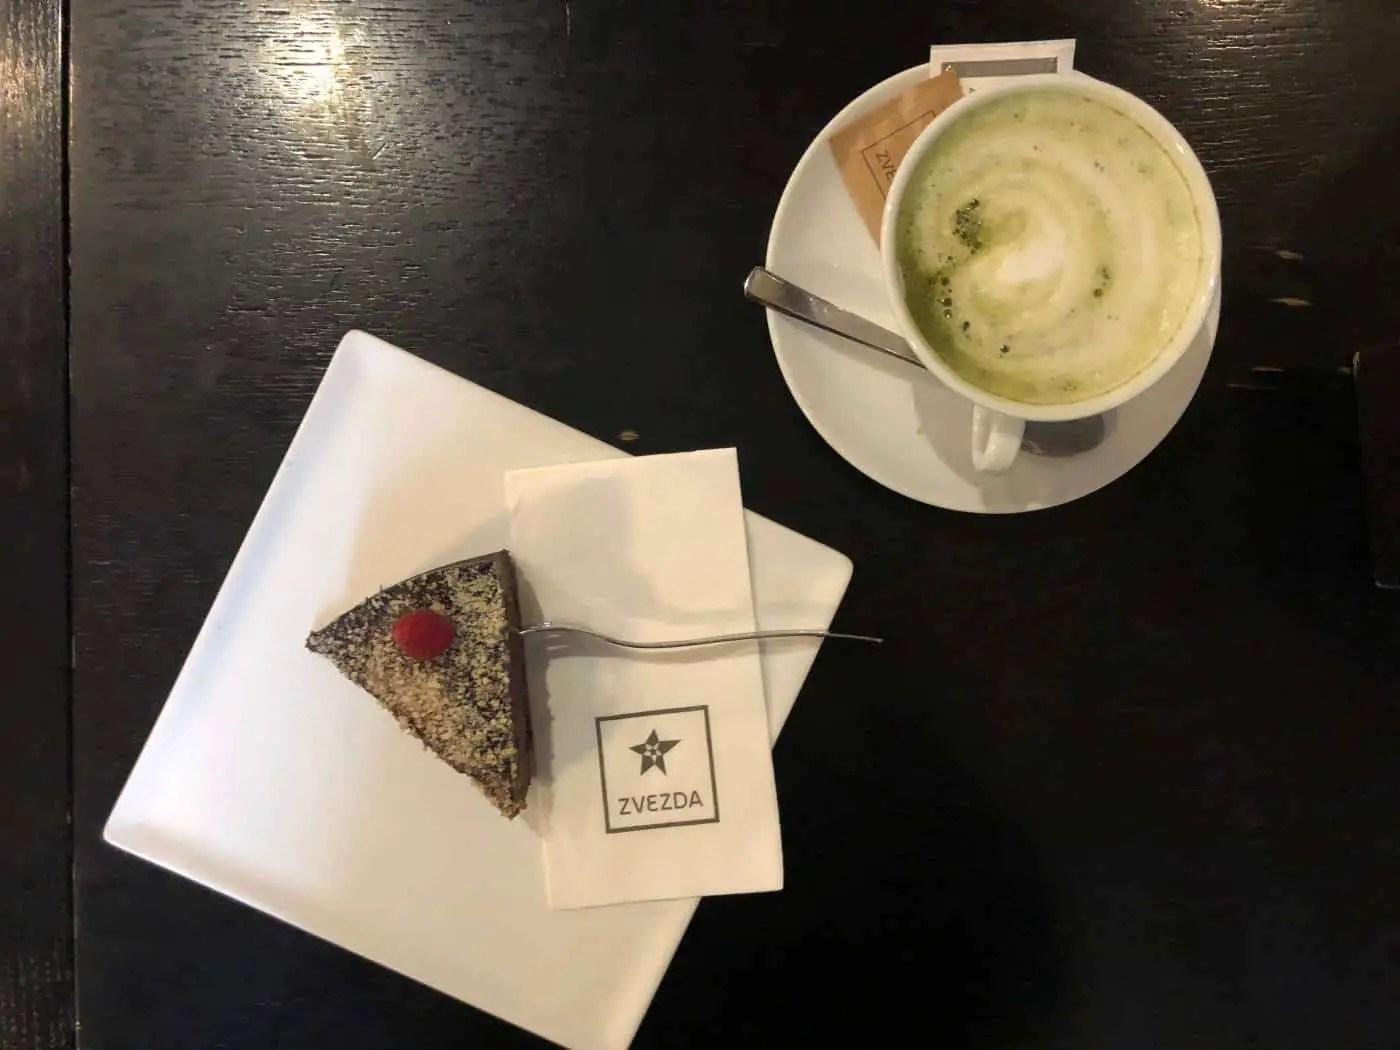 A Matcha Latte and Raw Cake from Zvevda in Ljubljana